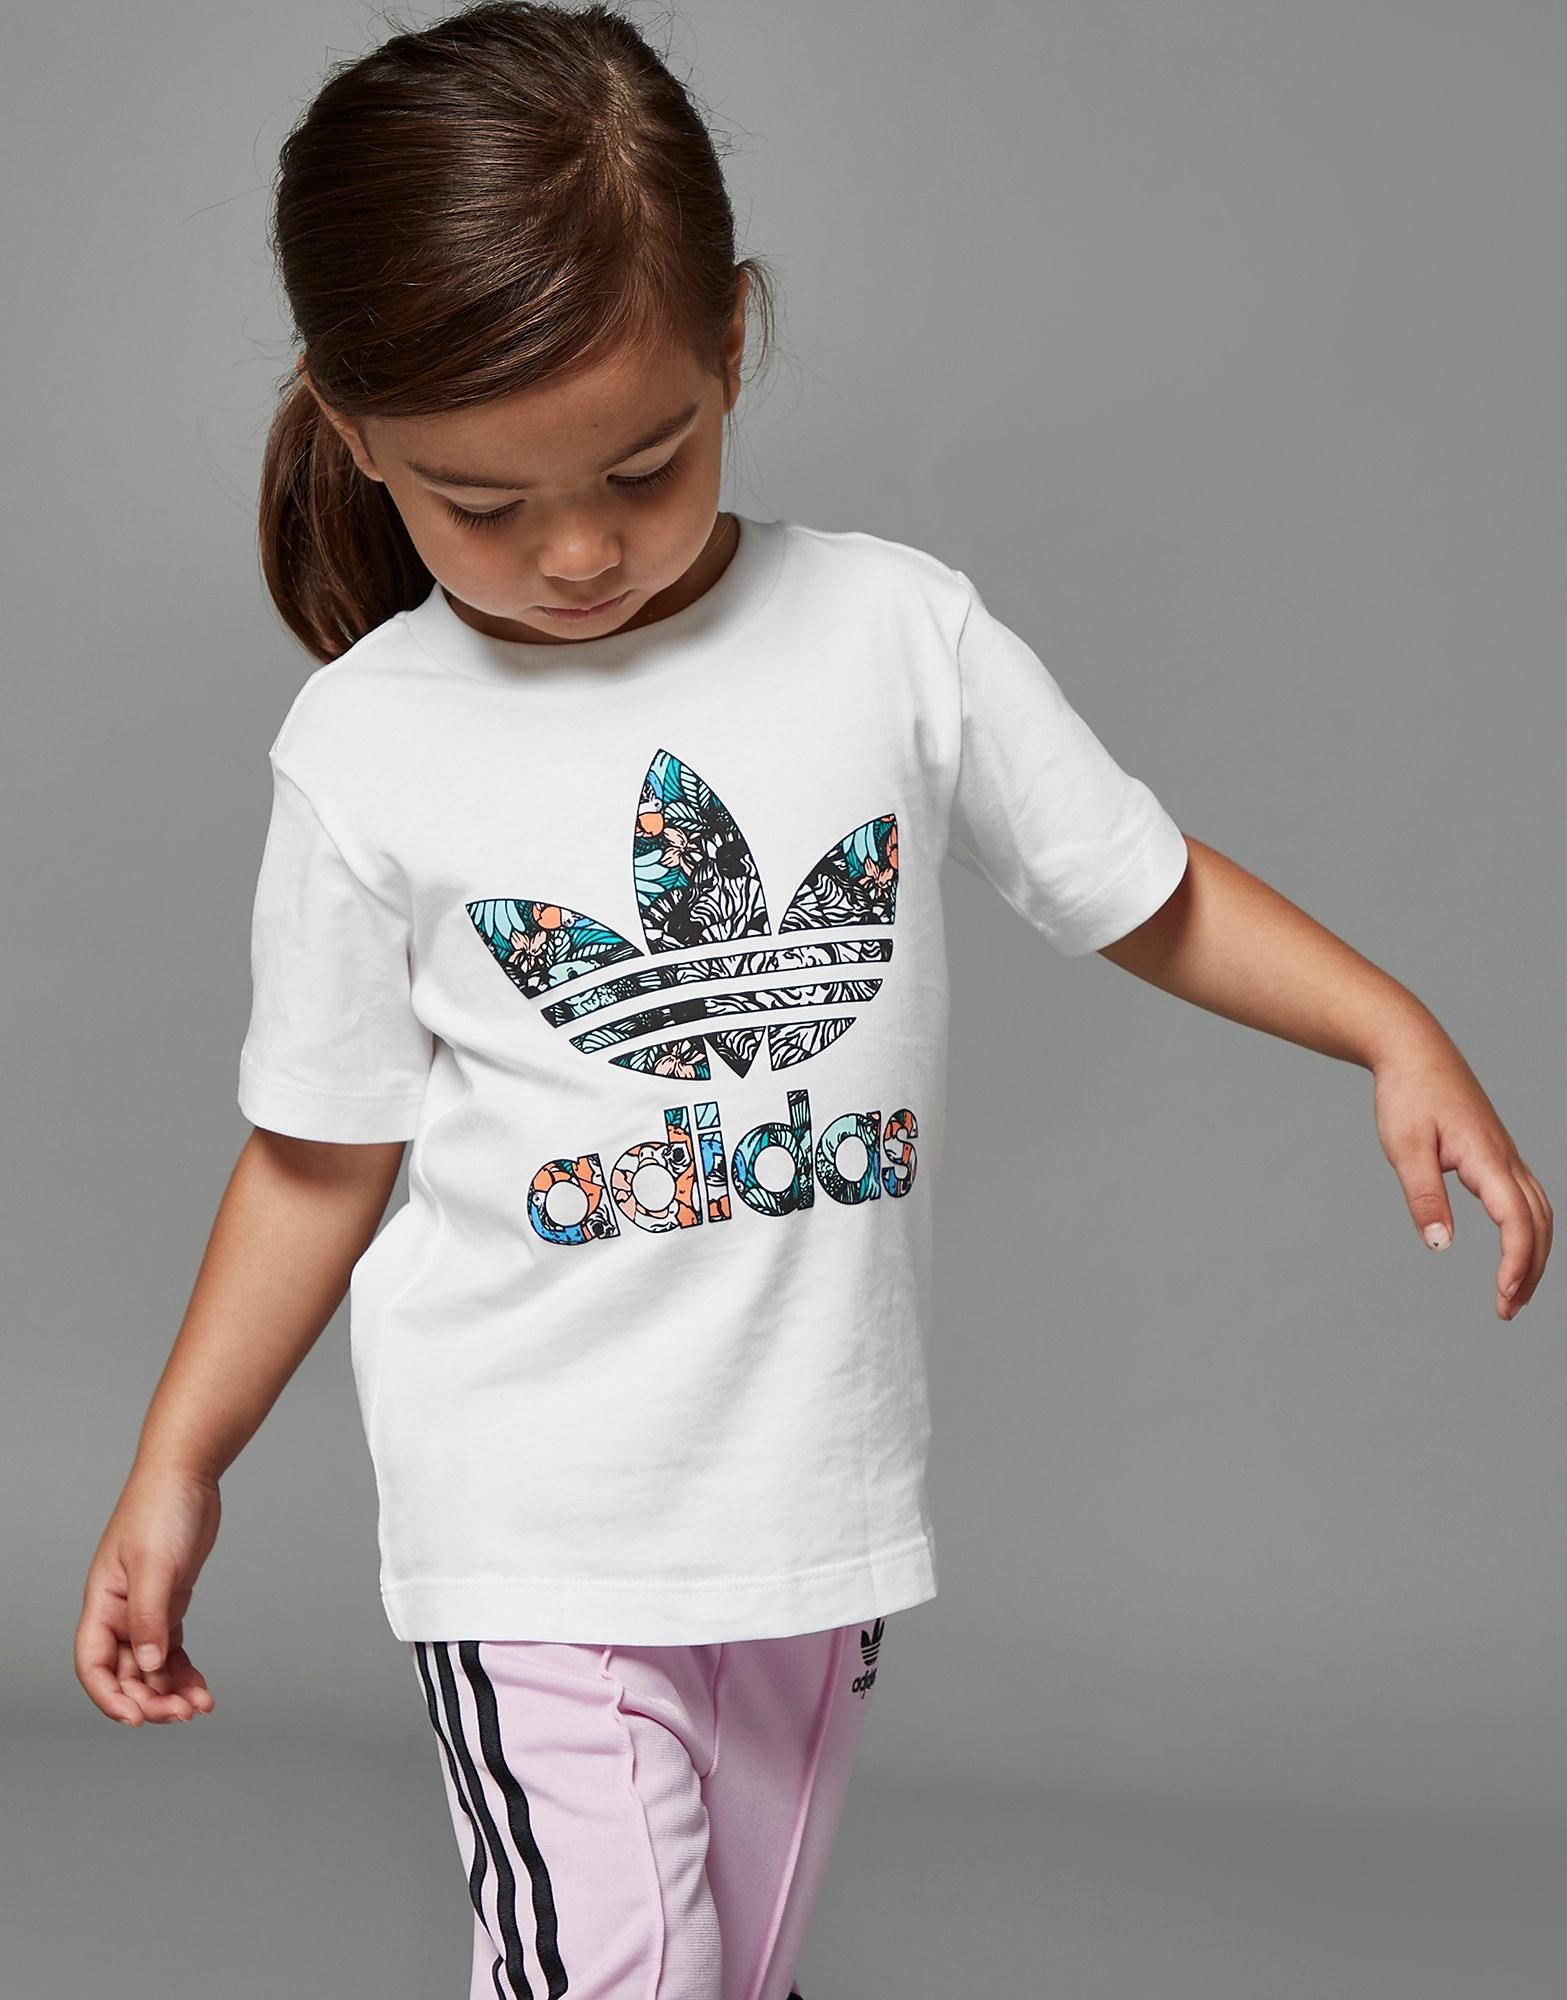 adidas Originals Girls' Zoo Infil T-Shirt Baby's - Wit - Kind